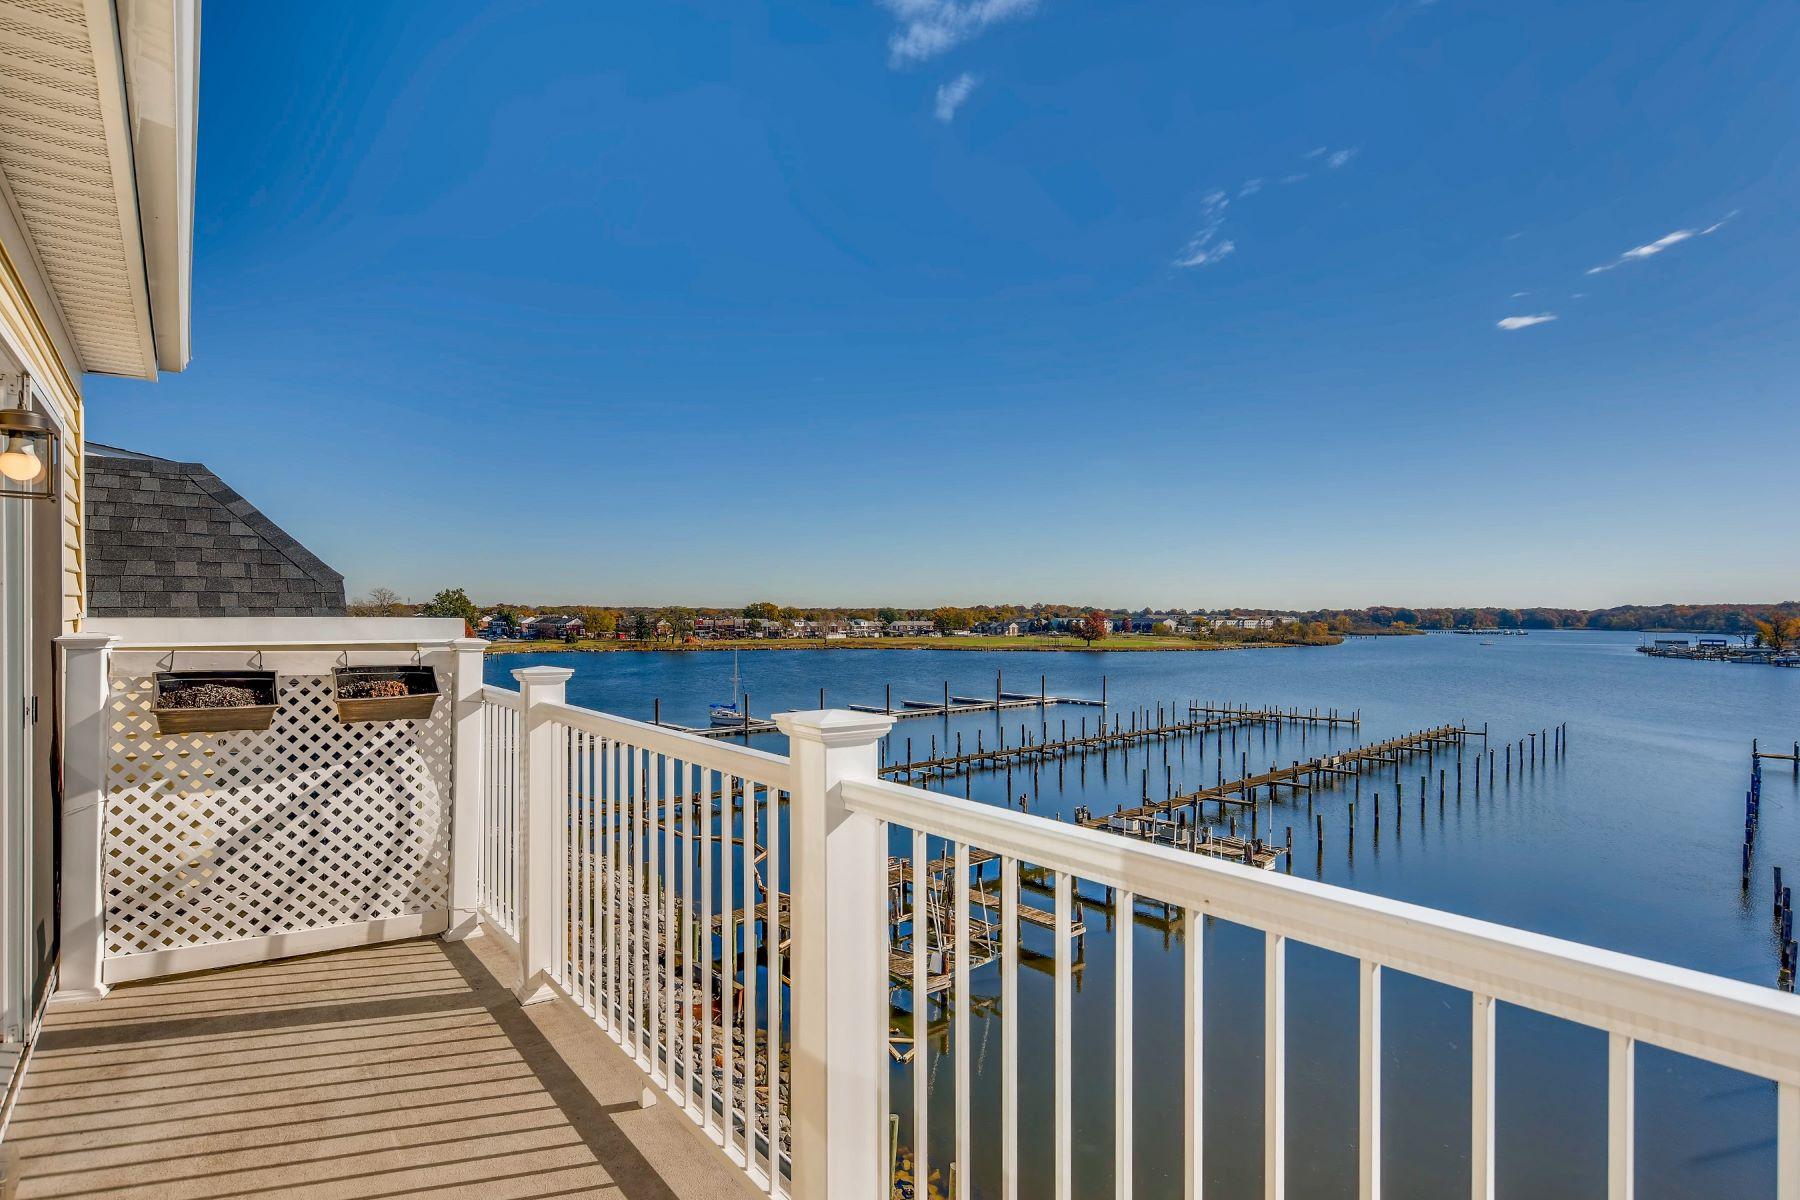 Additional photo for property listing at Sheltered Harbor 2017 Jetty Drive, Dundalk, Μεριλαντ 21222 Ηνωμένες Πολιτείες